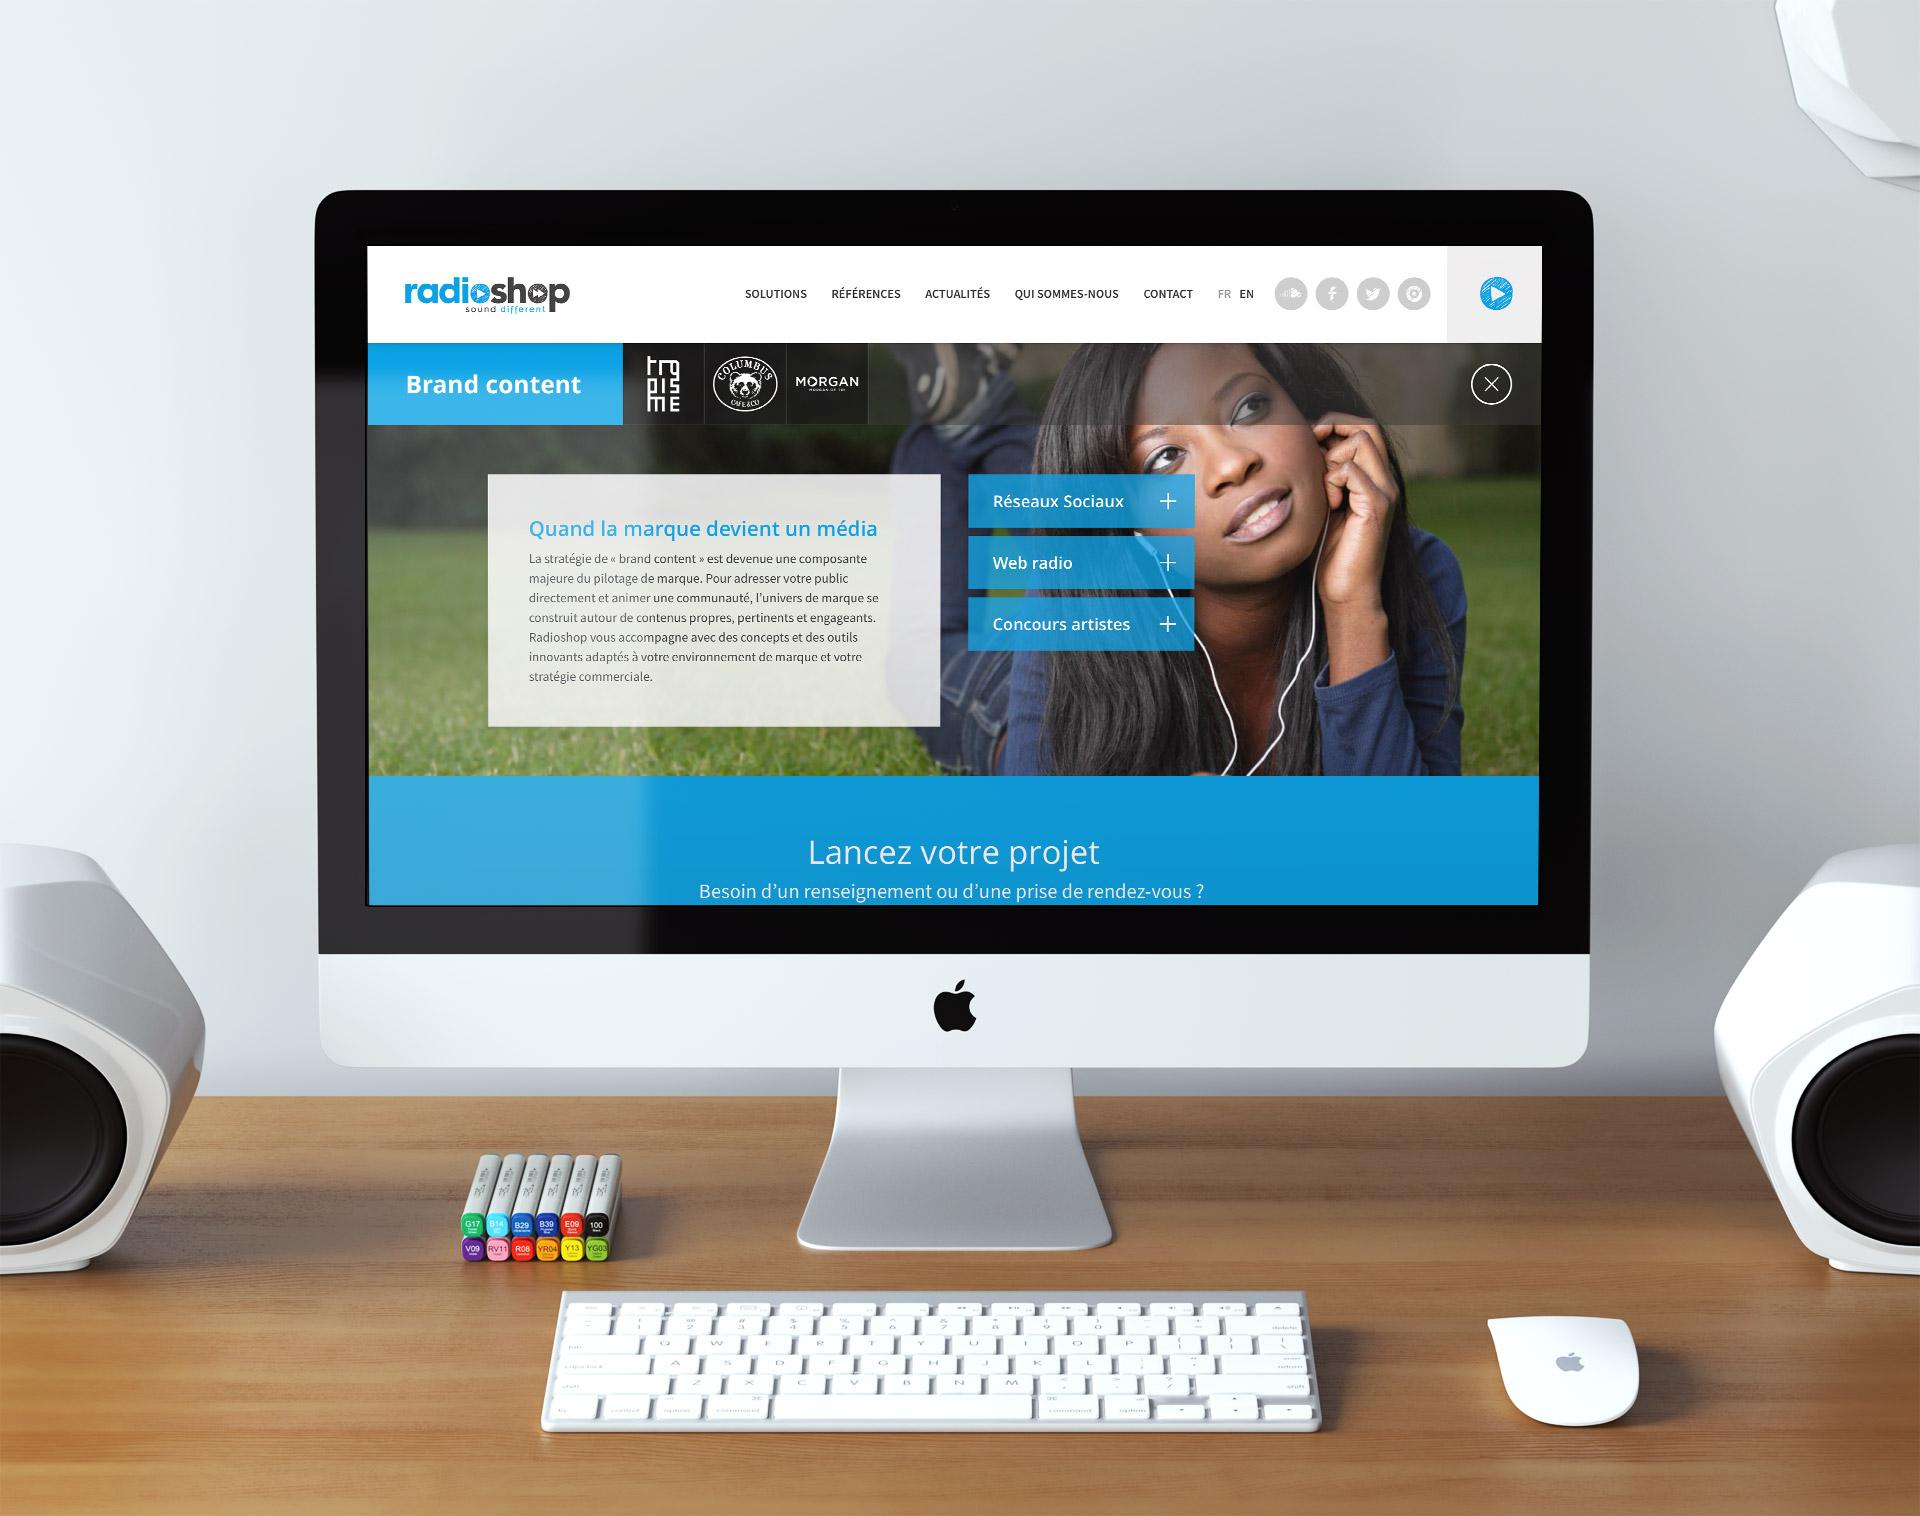 radioshop-creation-site-web-responsive-design-graphiste-montpellier-alexis-cretin-1